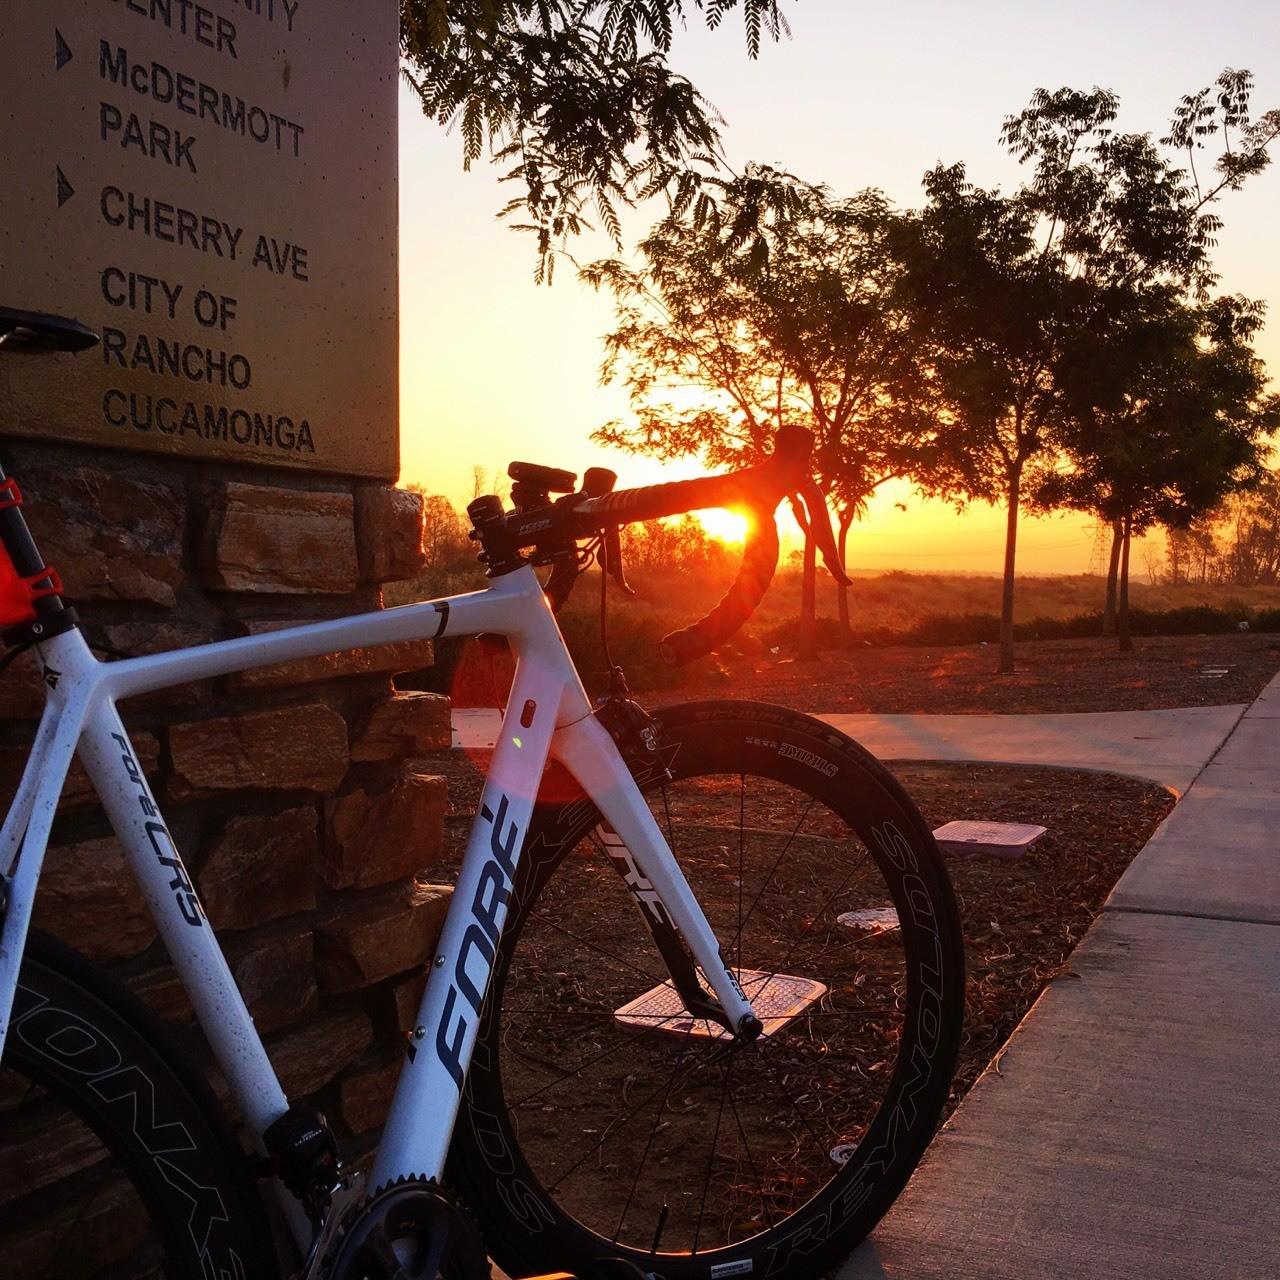 Sunrise on my bike.